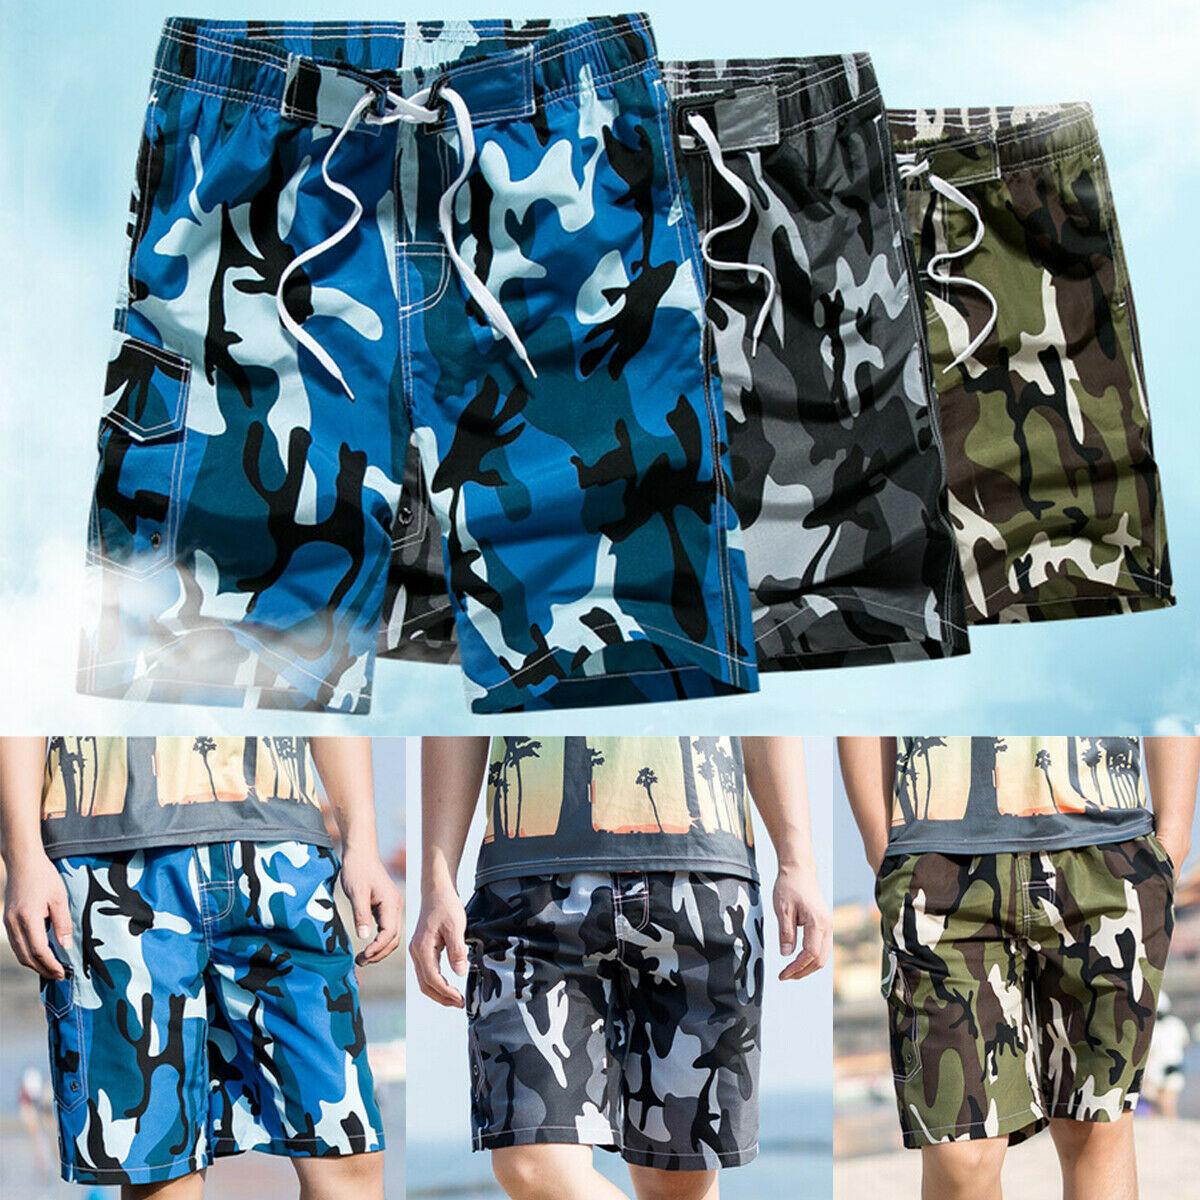 Men's Clothing Newest Men Surf Board Camouflage Shorts Summer Beach Pants Trunks Men Fashion Loose Short Pants Board Shorts